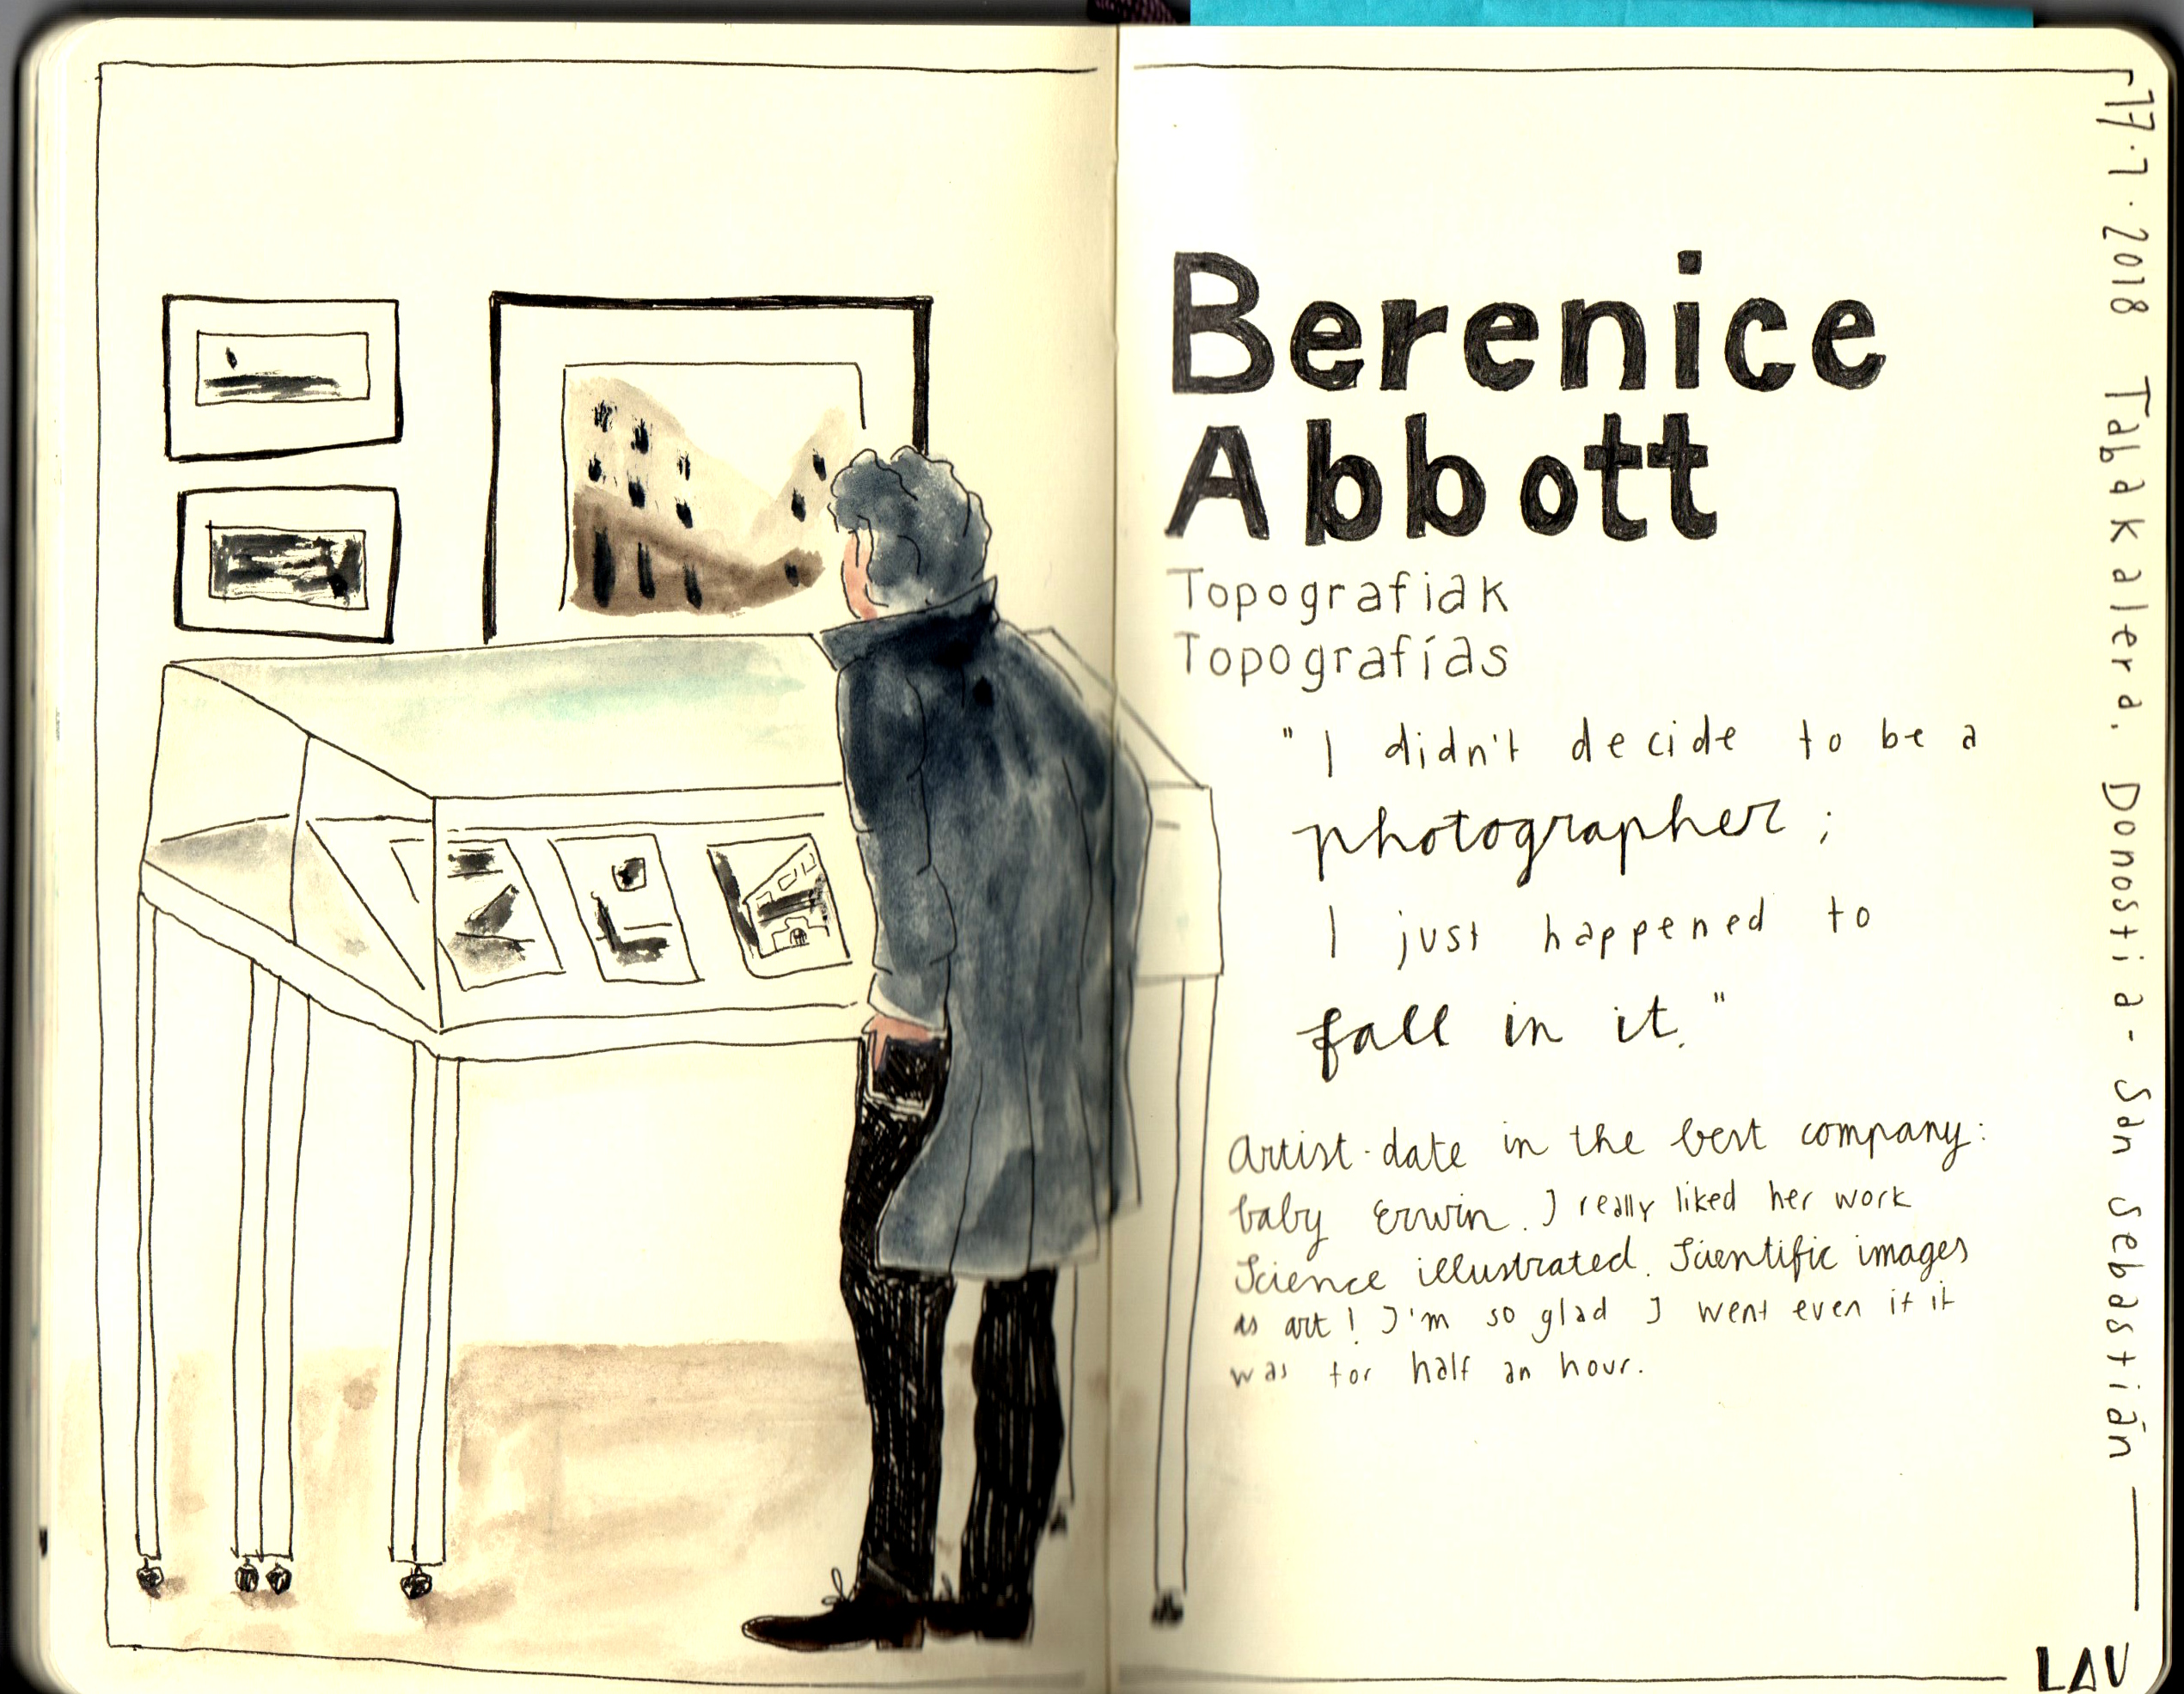 Artist date Laurien Baart